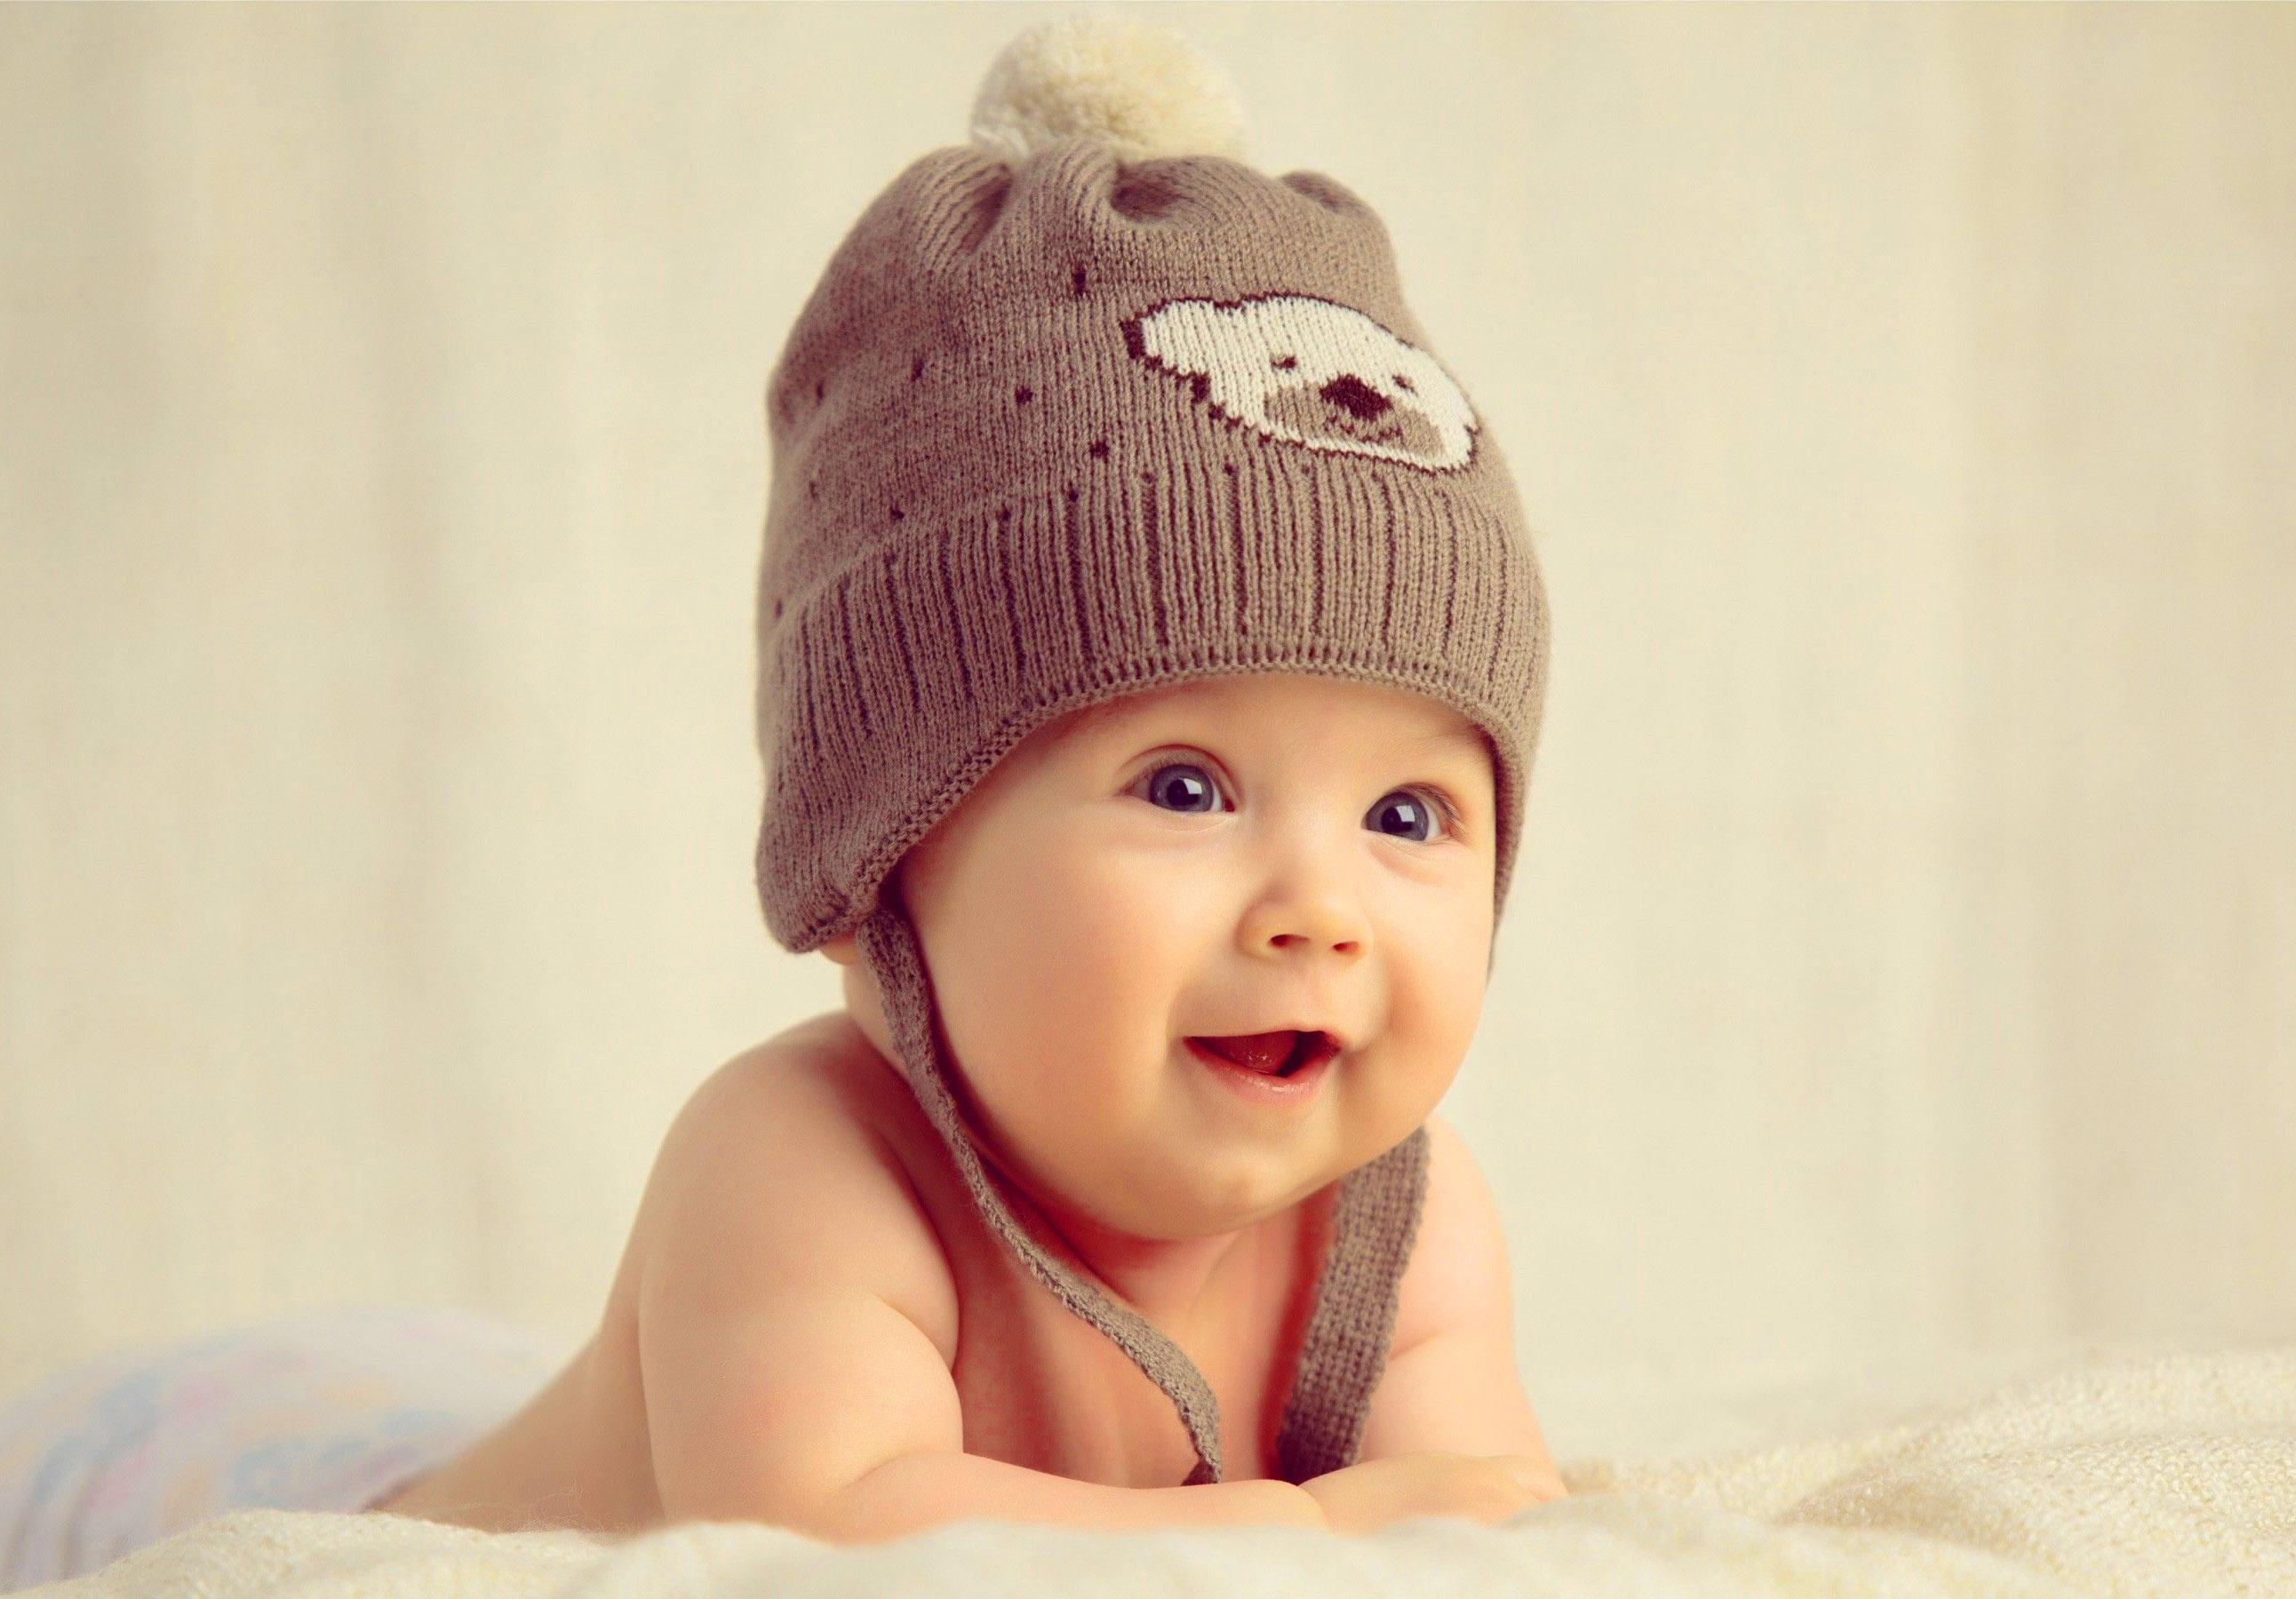 Cute Baby Girl Dp Images Pics Download